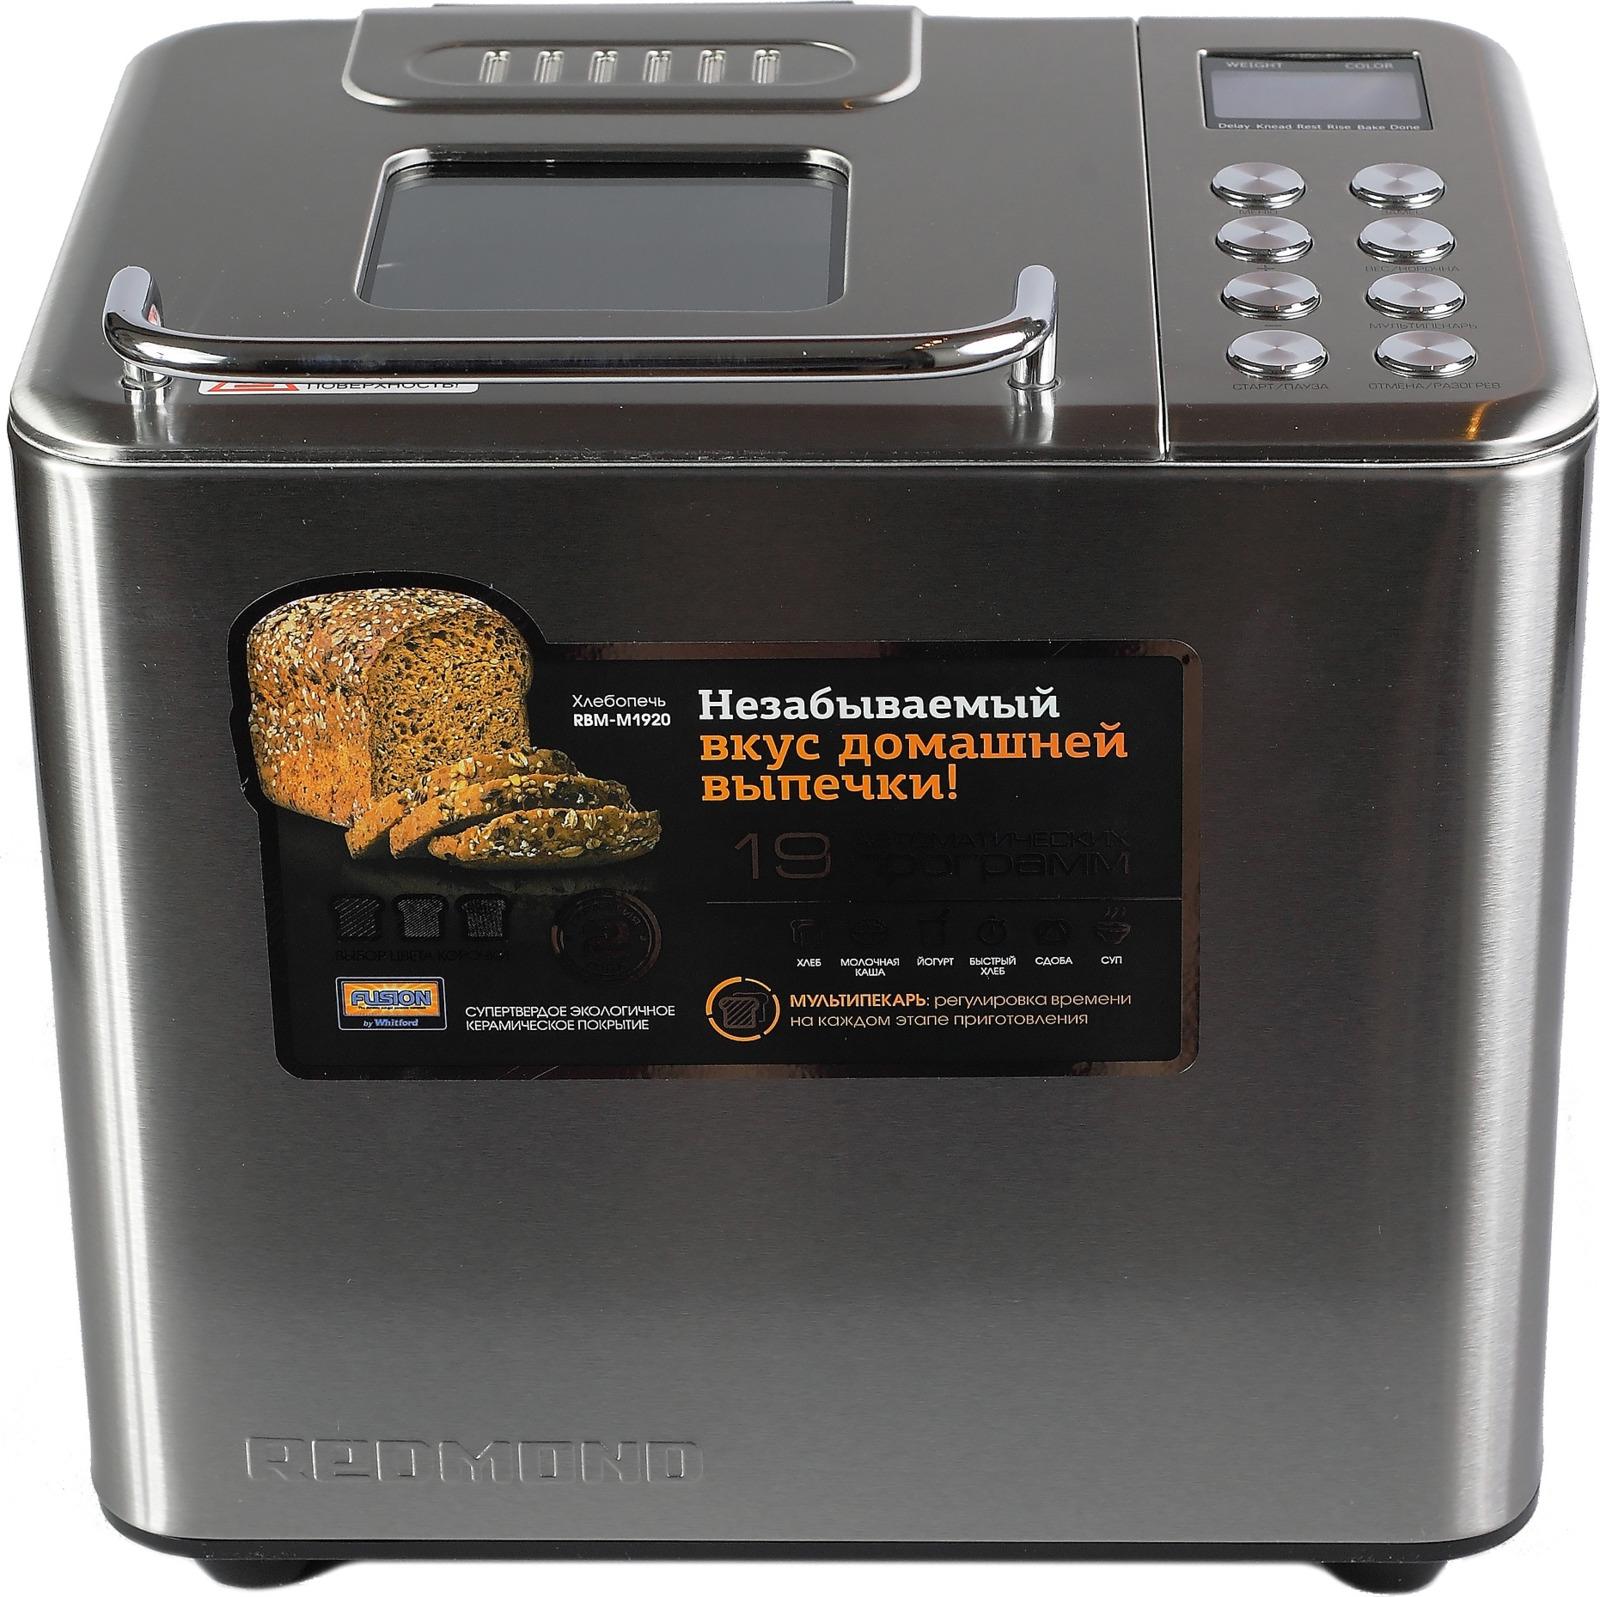 Хлебопечь Redmond RBM-M1920, серебристый